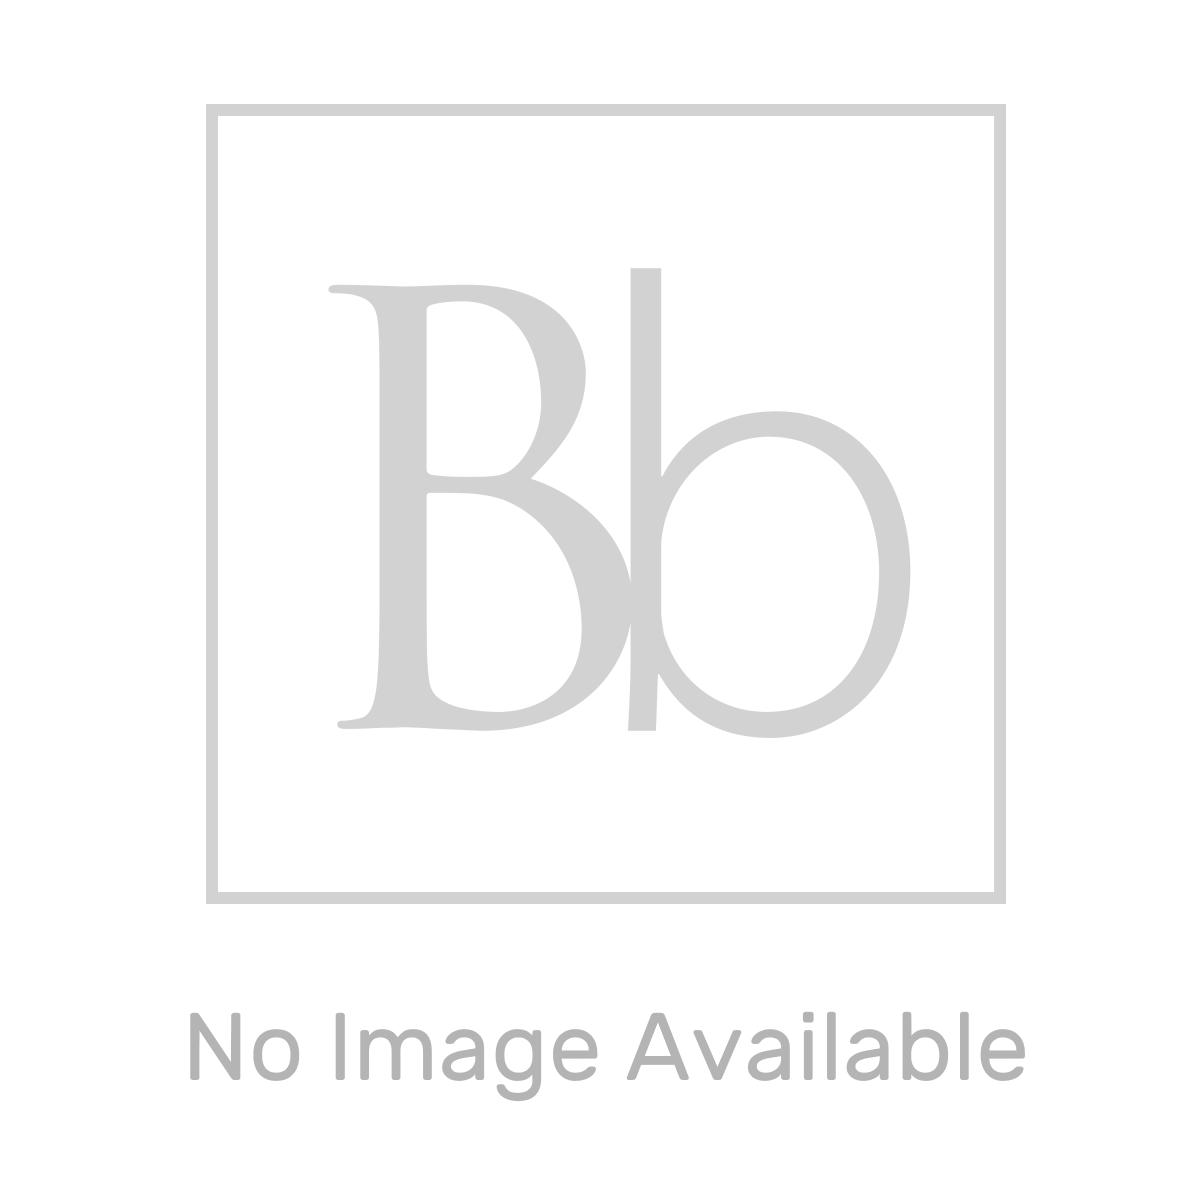 Aquadart White Slate Shower Tray 1200 x 700